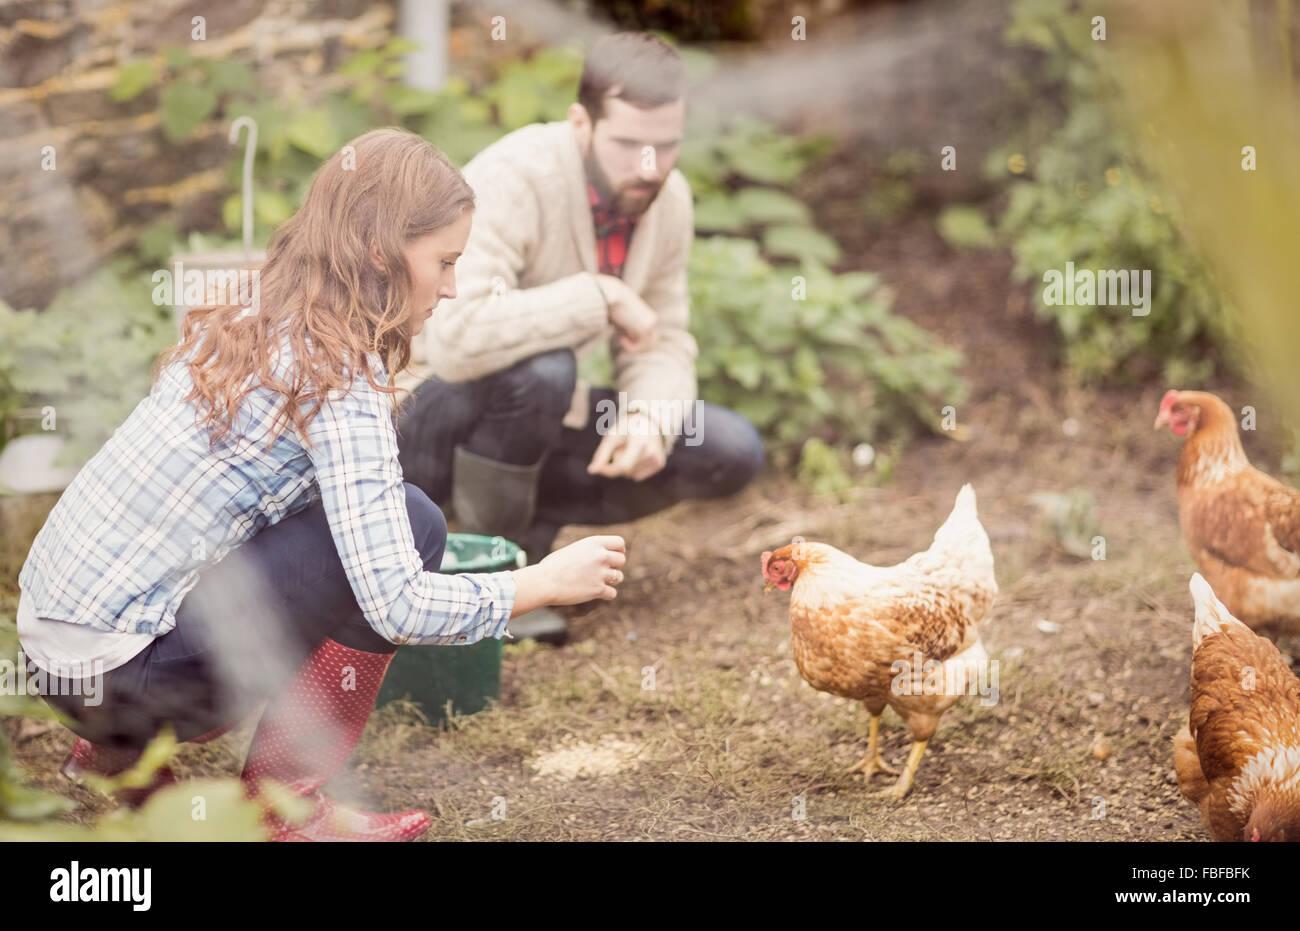 Paar Fütterung Huhn zusammen Stockbild